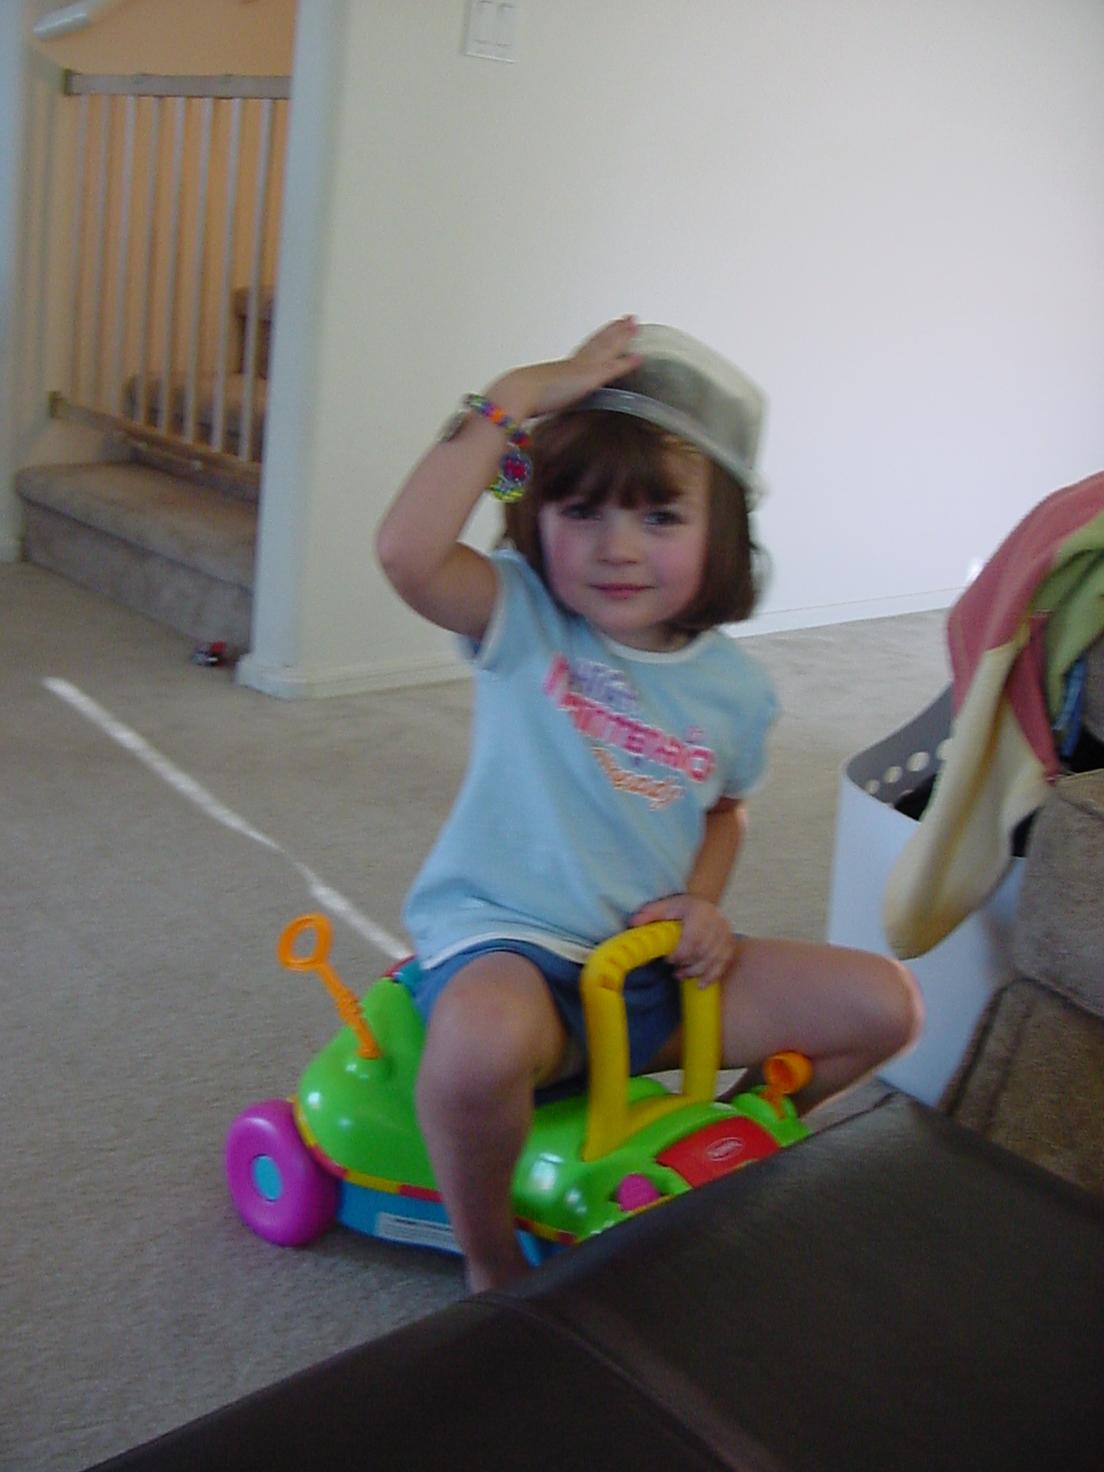 2008-07-28-allison-with-a-helmet-hat.JPG